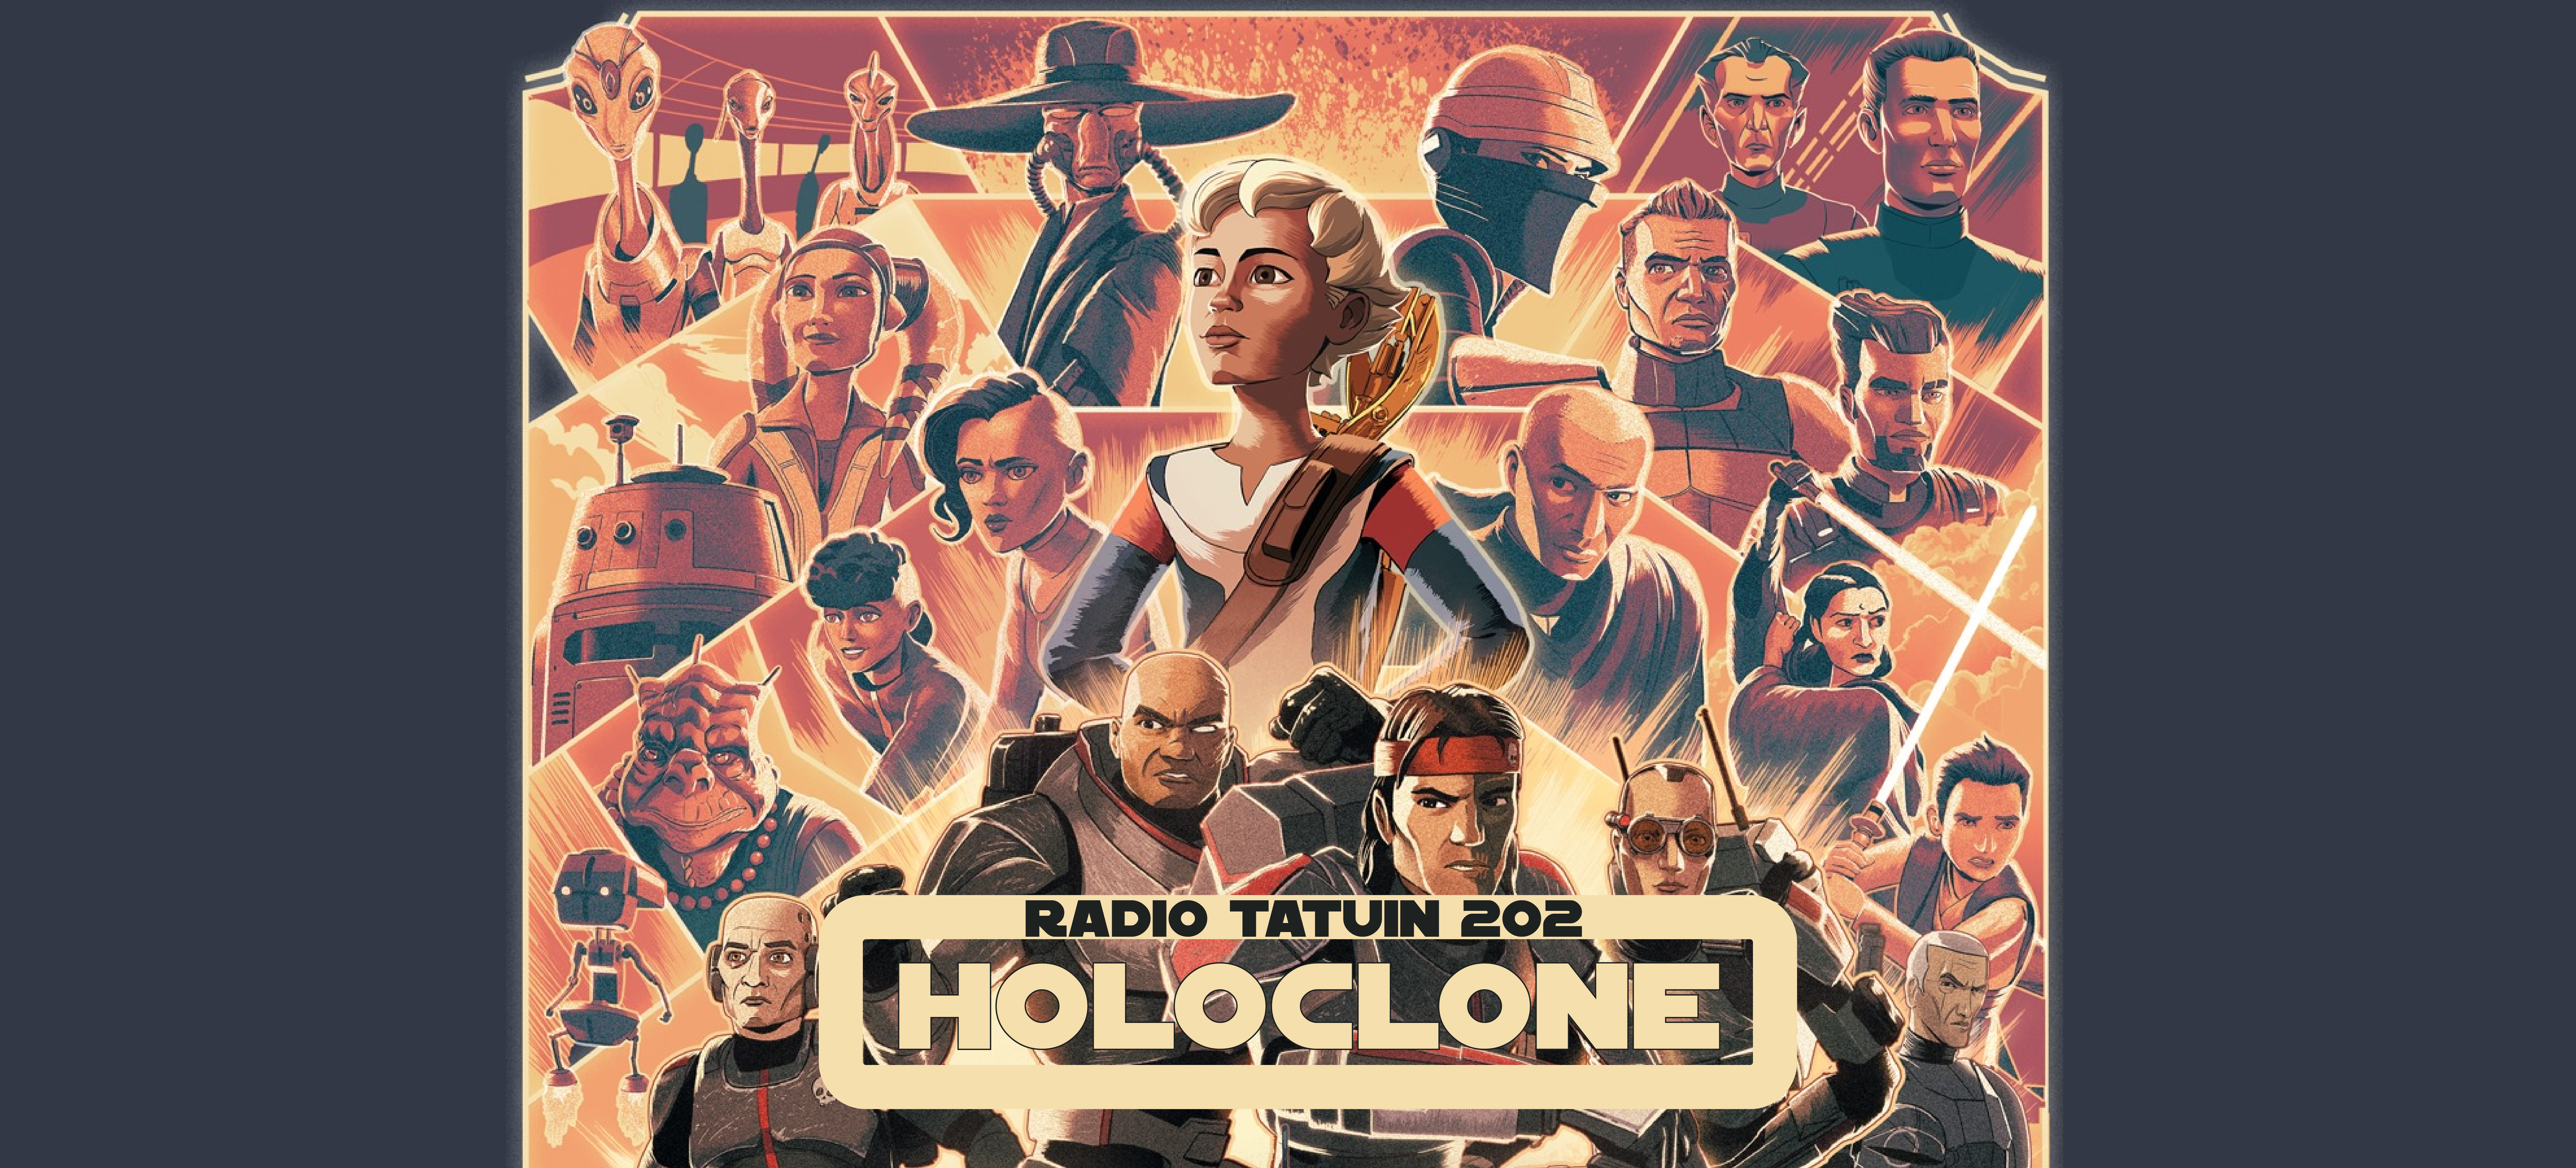 HoloClone#12